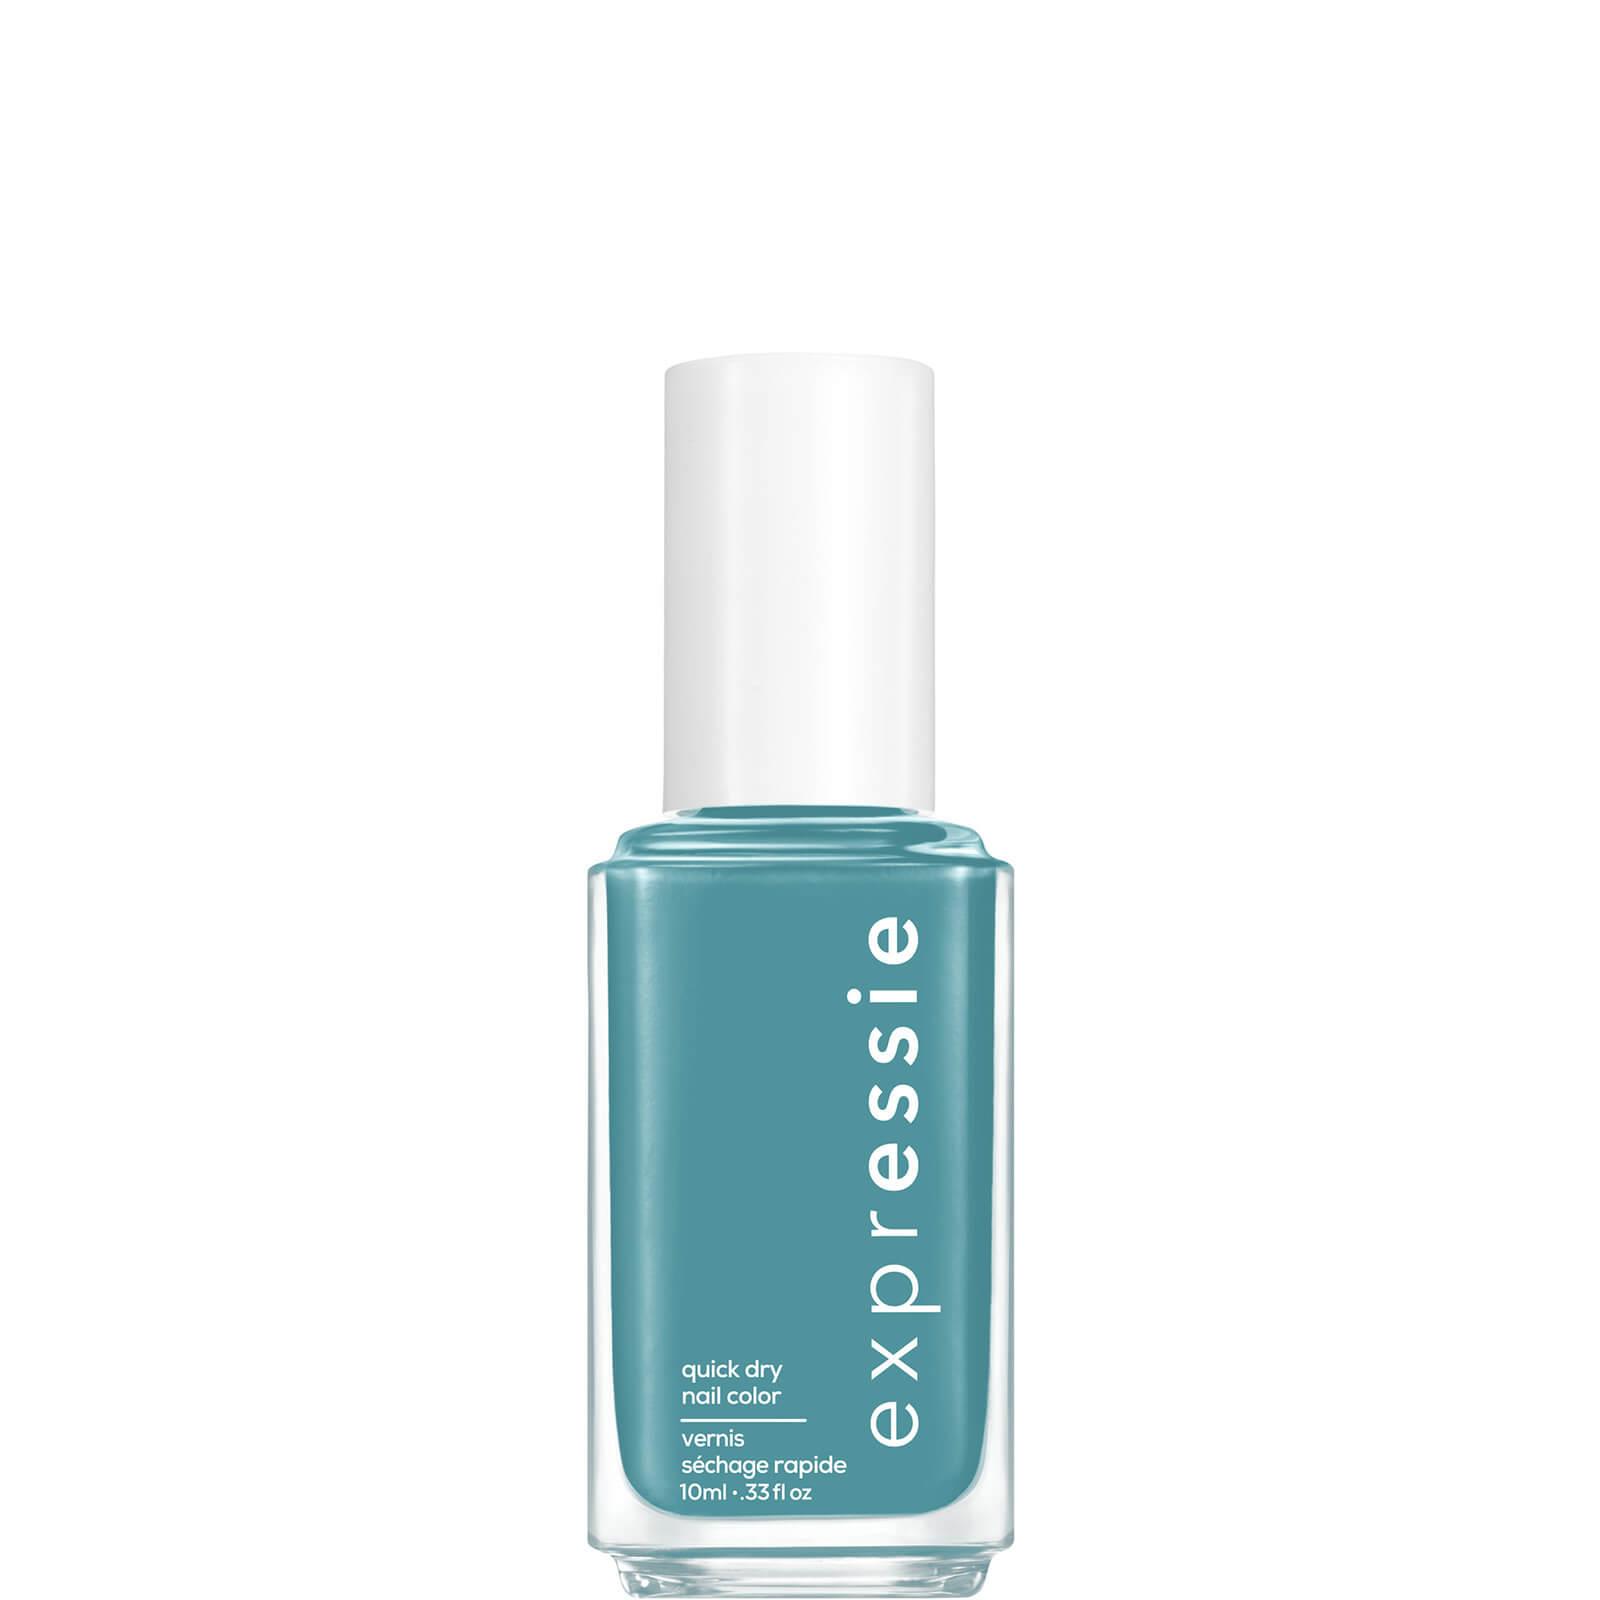 Купить Essie Expressie Quick Dry Formula Nail Polish 13.5ml (Various Shades) - 335 Up Up Away Message